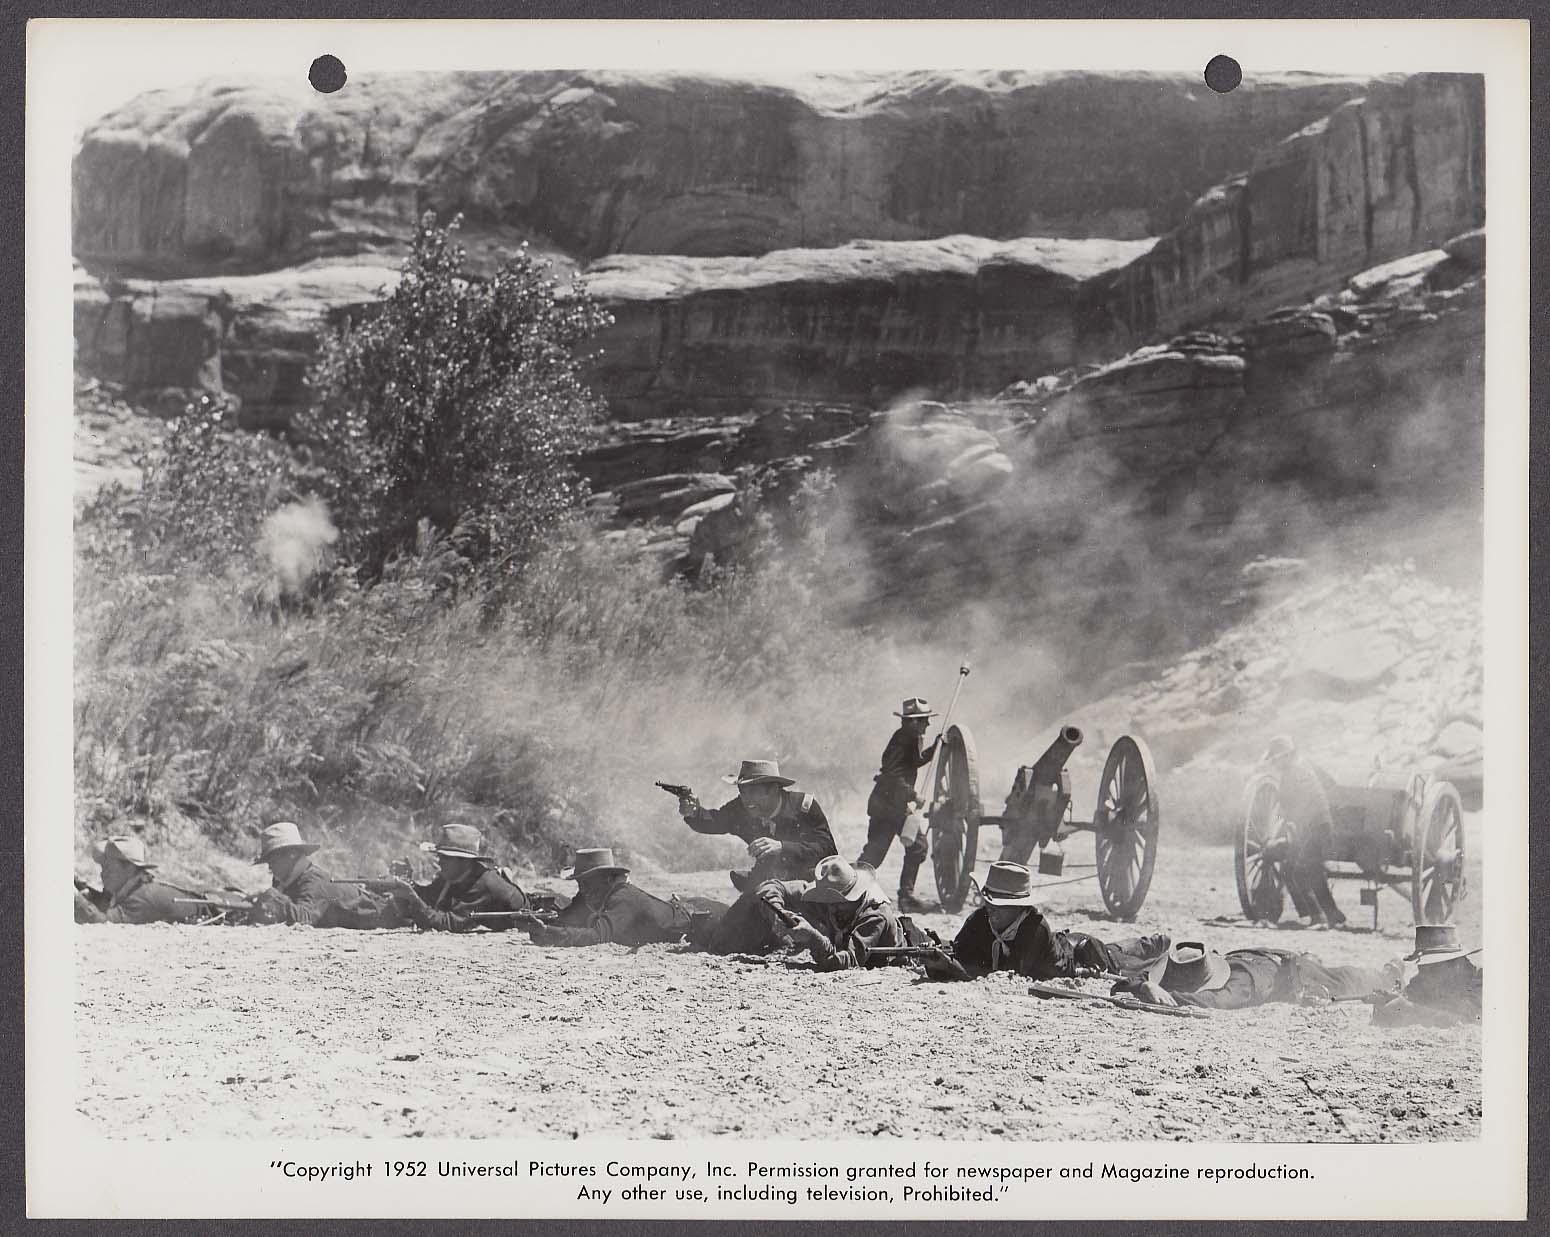 Artillery cannon Battle at Apache Pass 8x10 photo 1952 #67